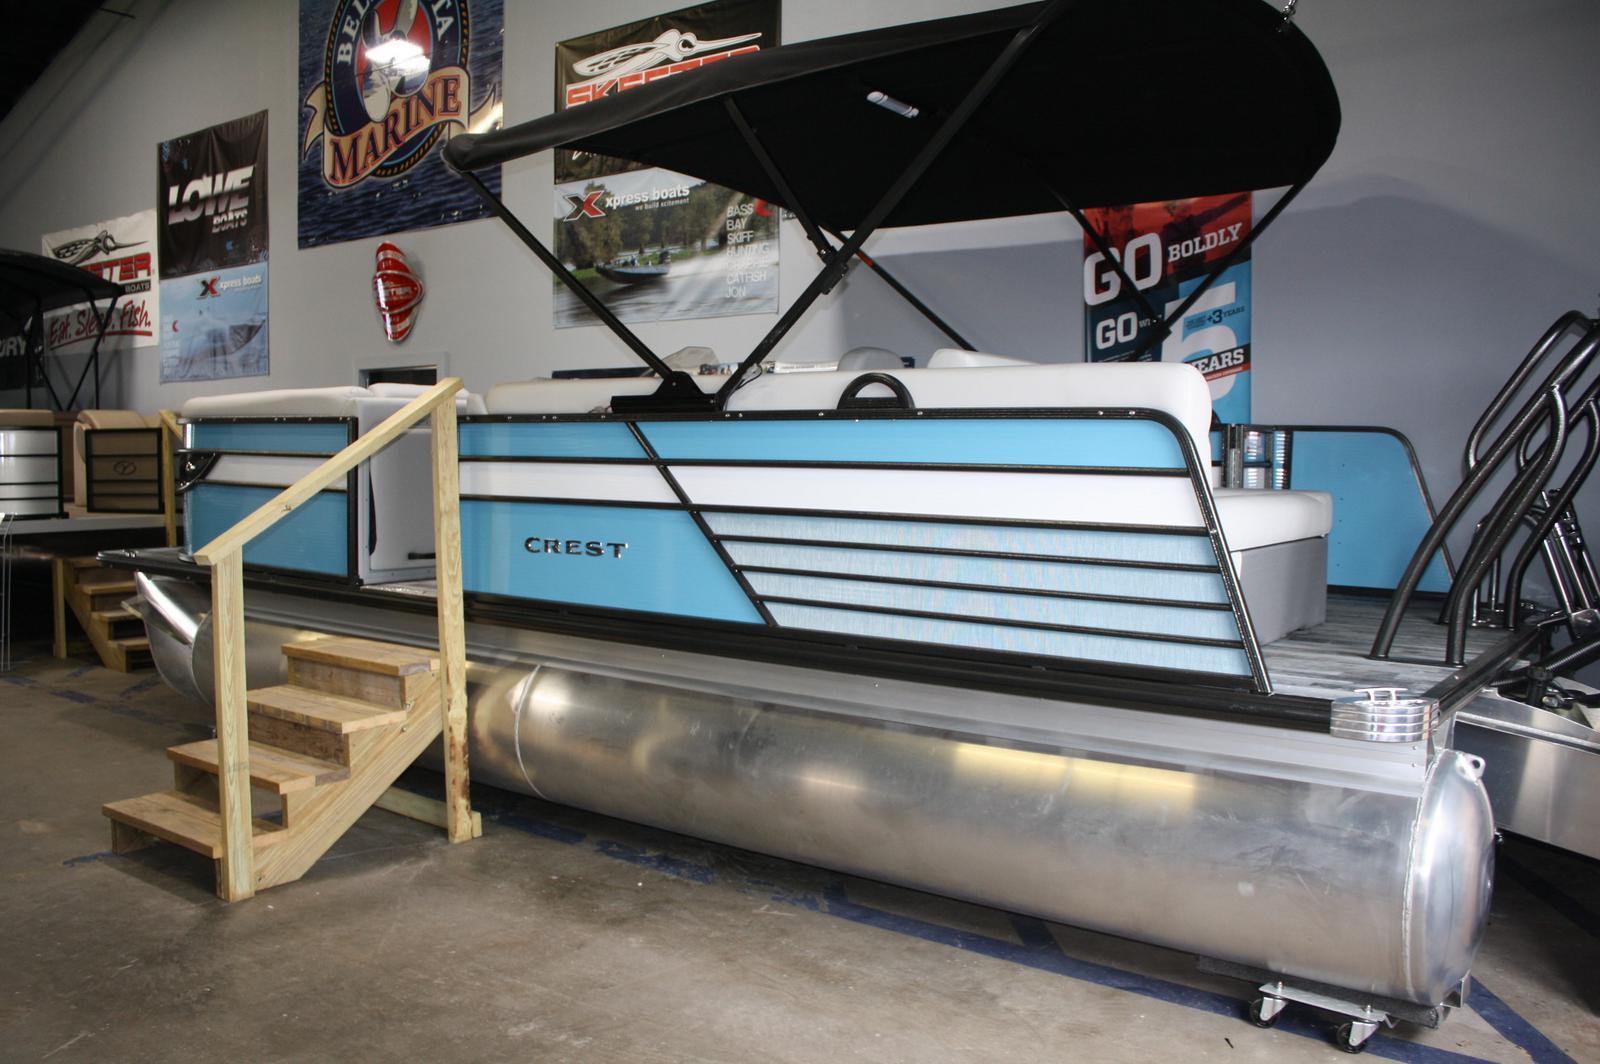 Inventory Bella Vista Marine Rogers, AR (479) 636-3200